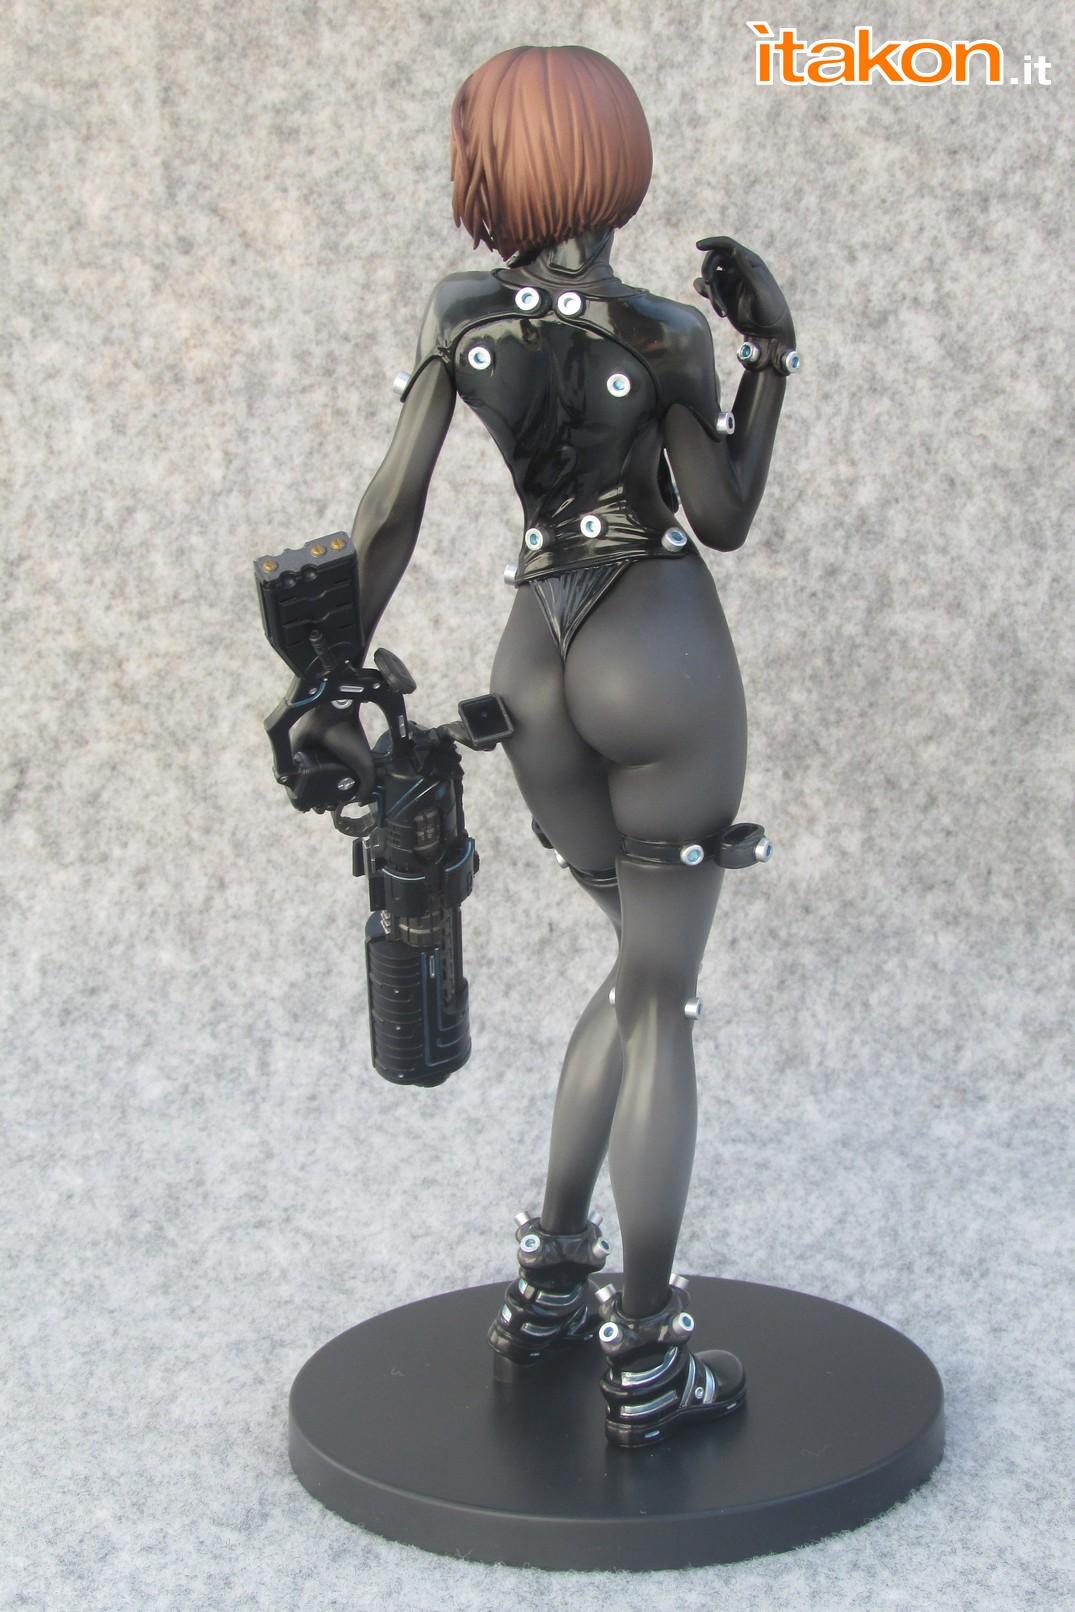 Link a Recensione review Yamasaki Anzu X Shotgun ver. da Gantz 0 di Union Creative International Ltd Itakon.it 19